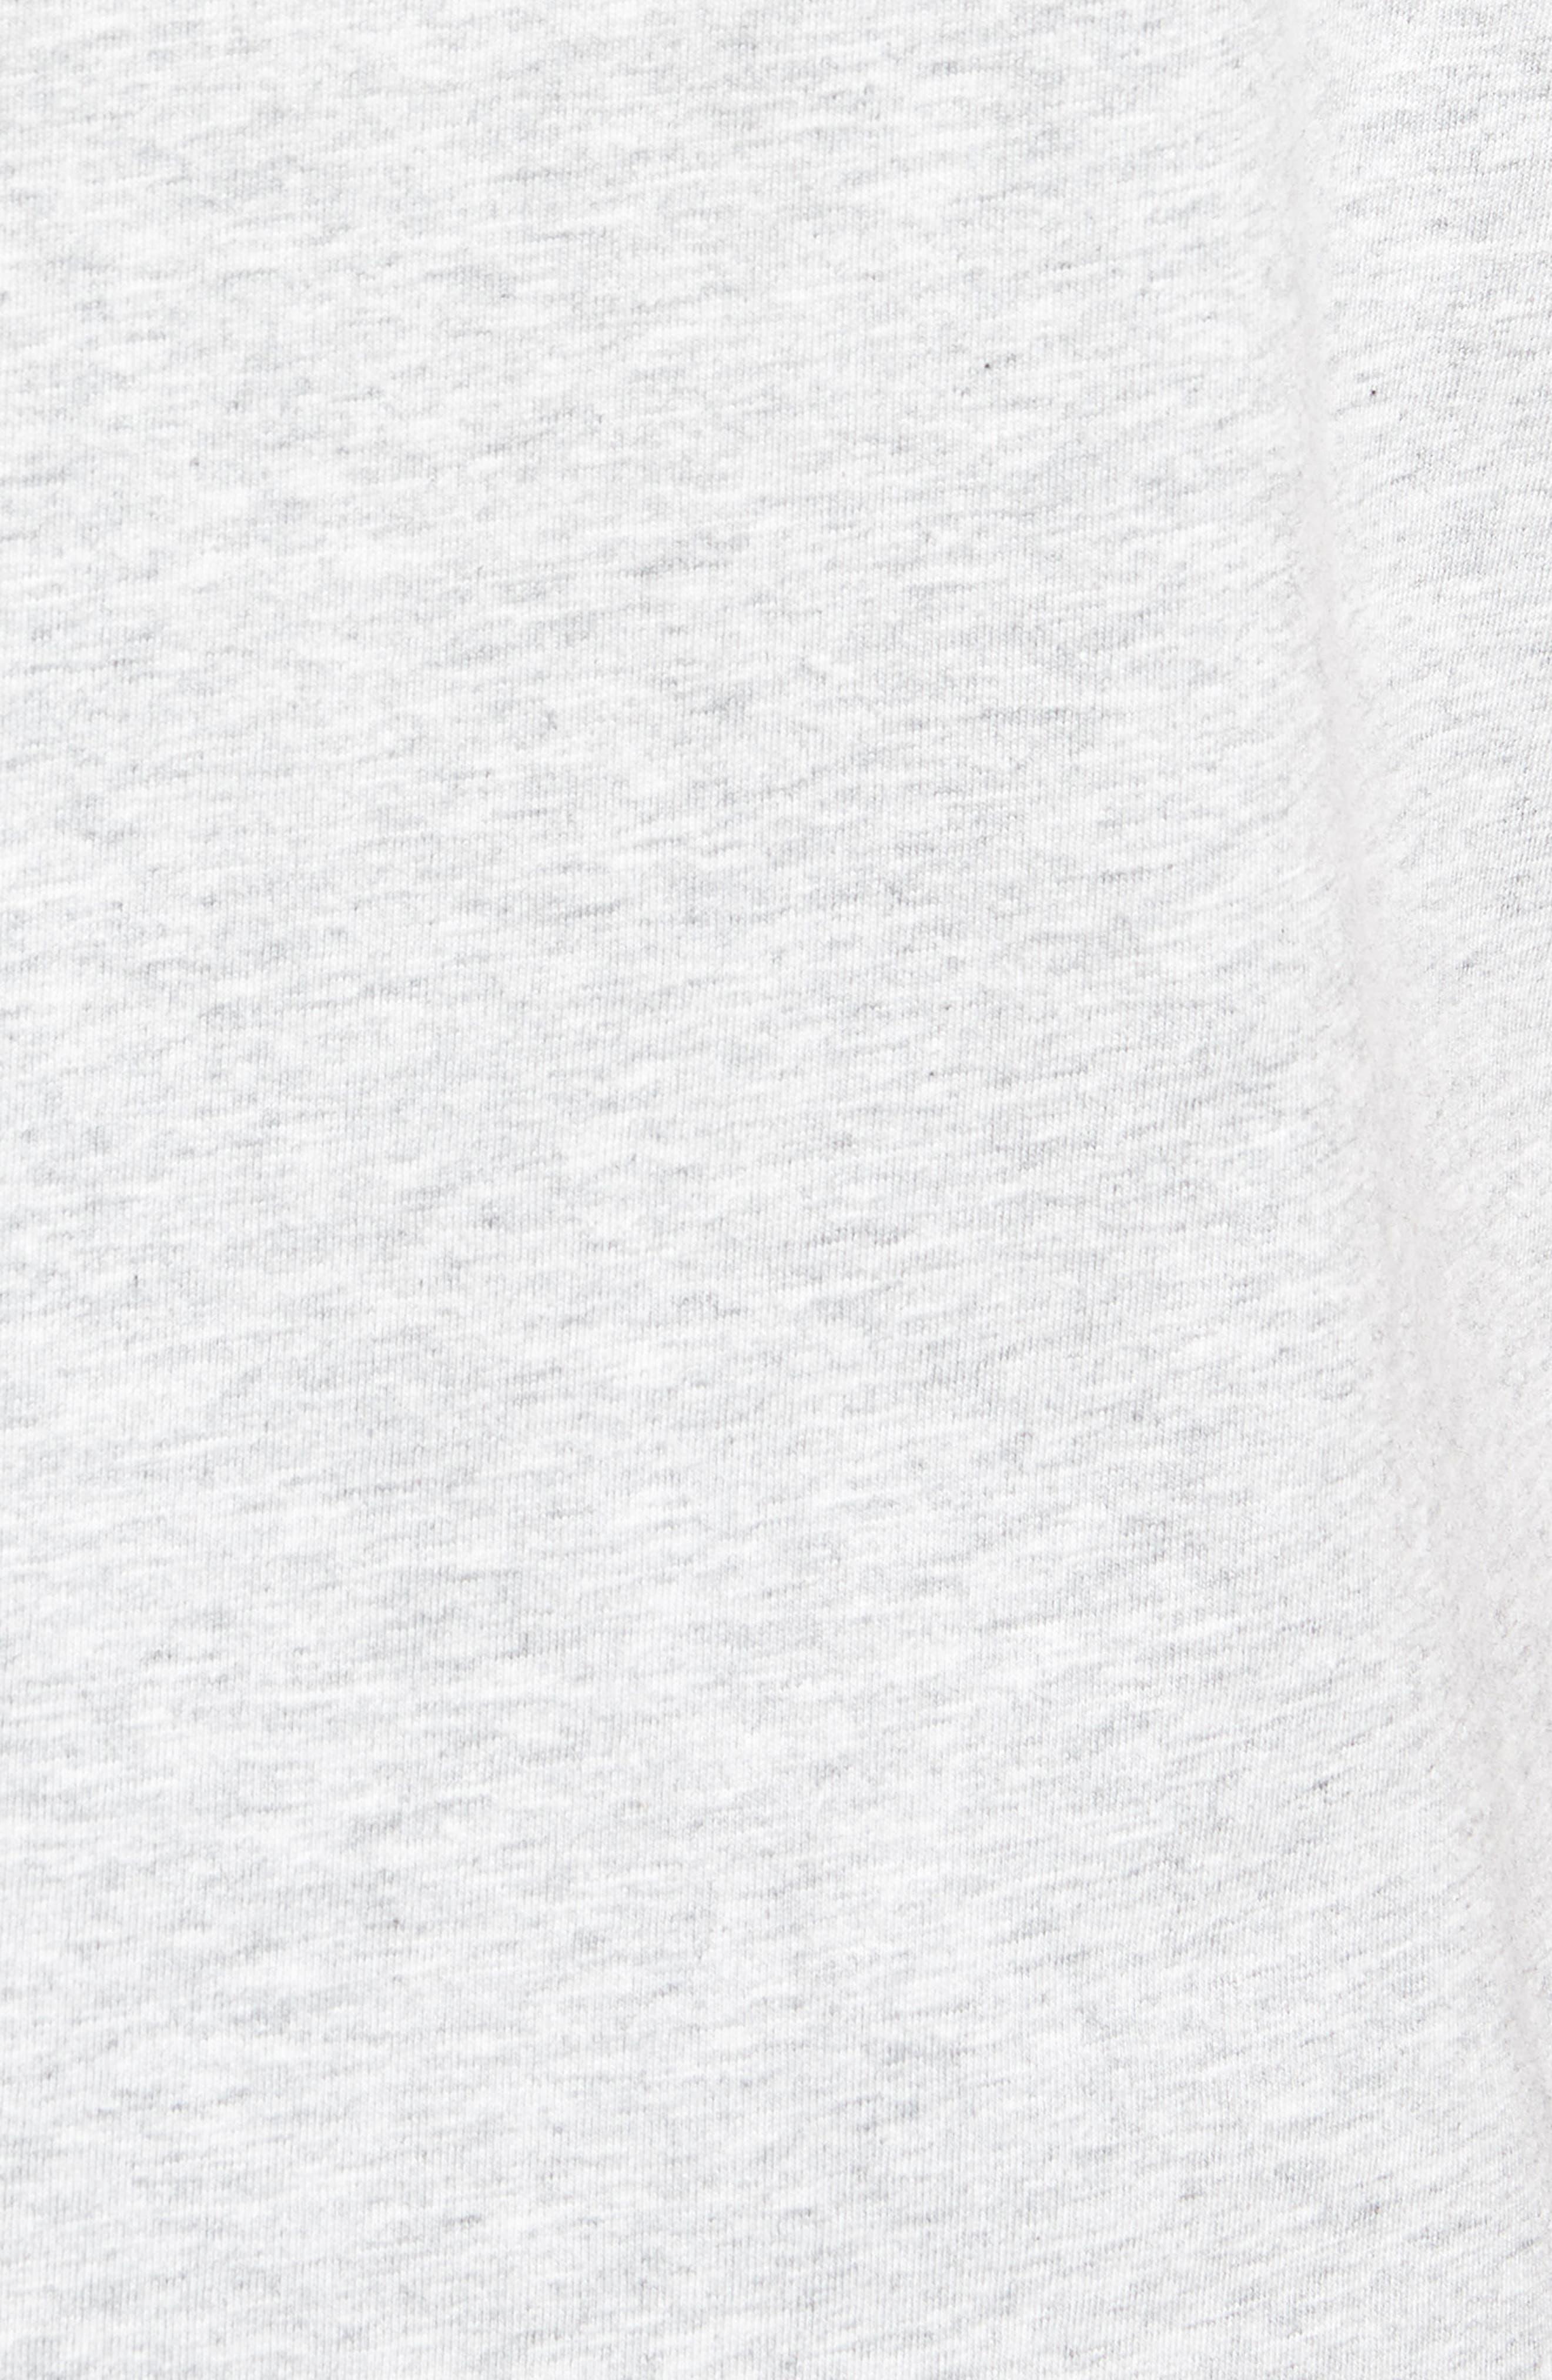 Knockout Sportfisher T-Shirt,                             Alternate thumbnail 5, color,                             GRAY HEATHER